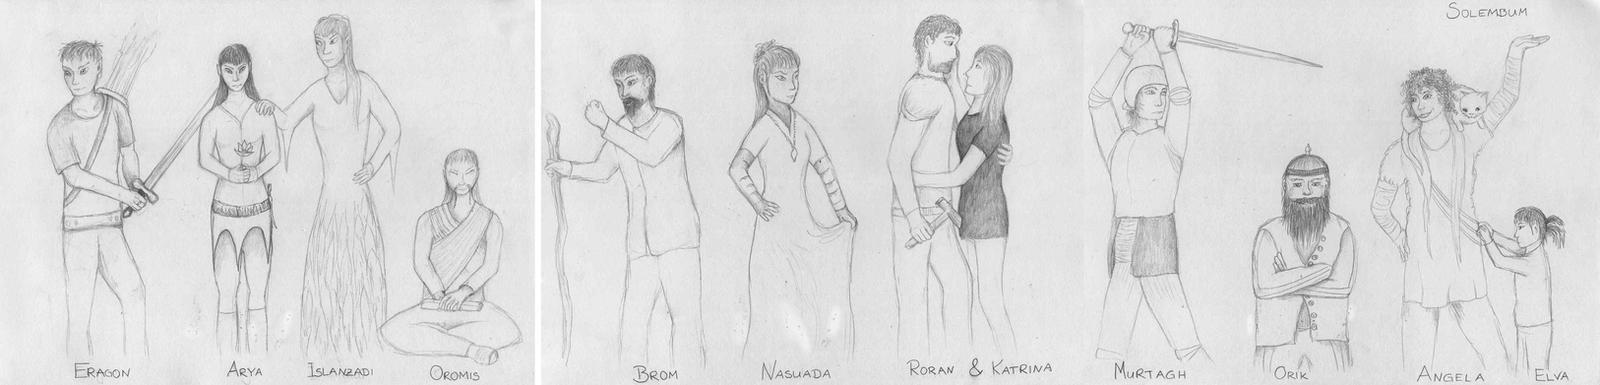 Eragon Book Characters My Eragon Character de...